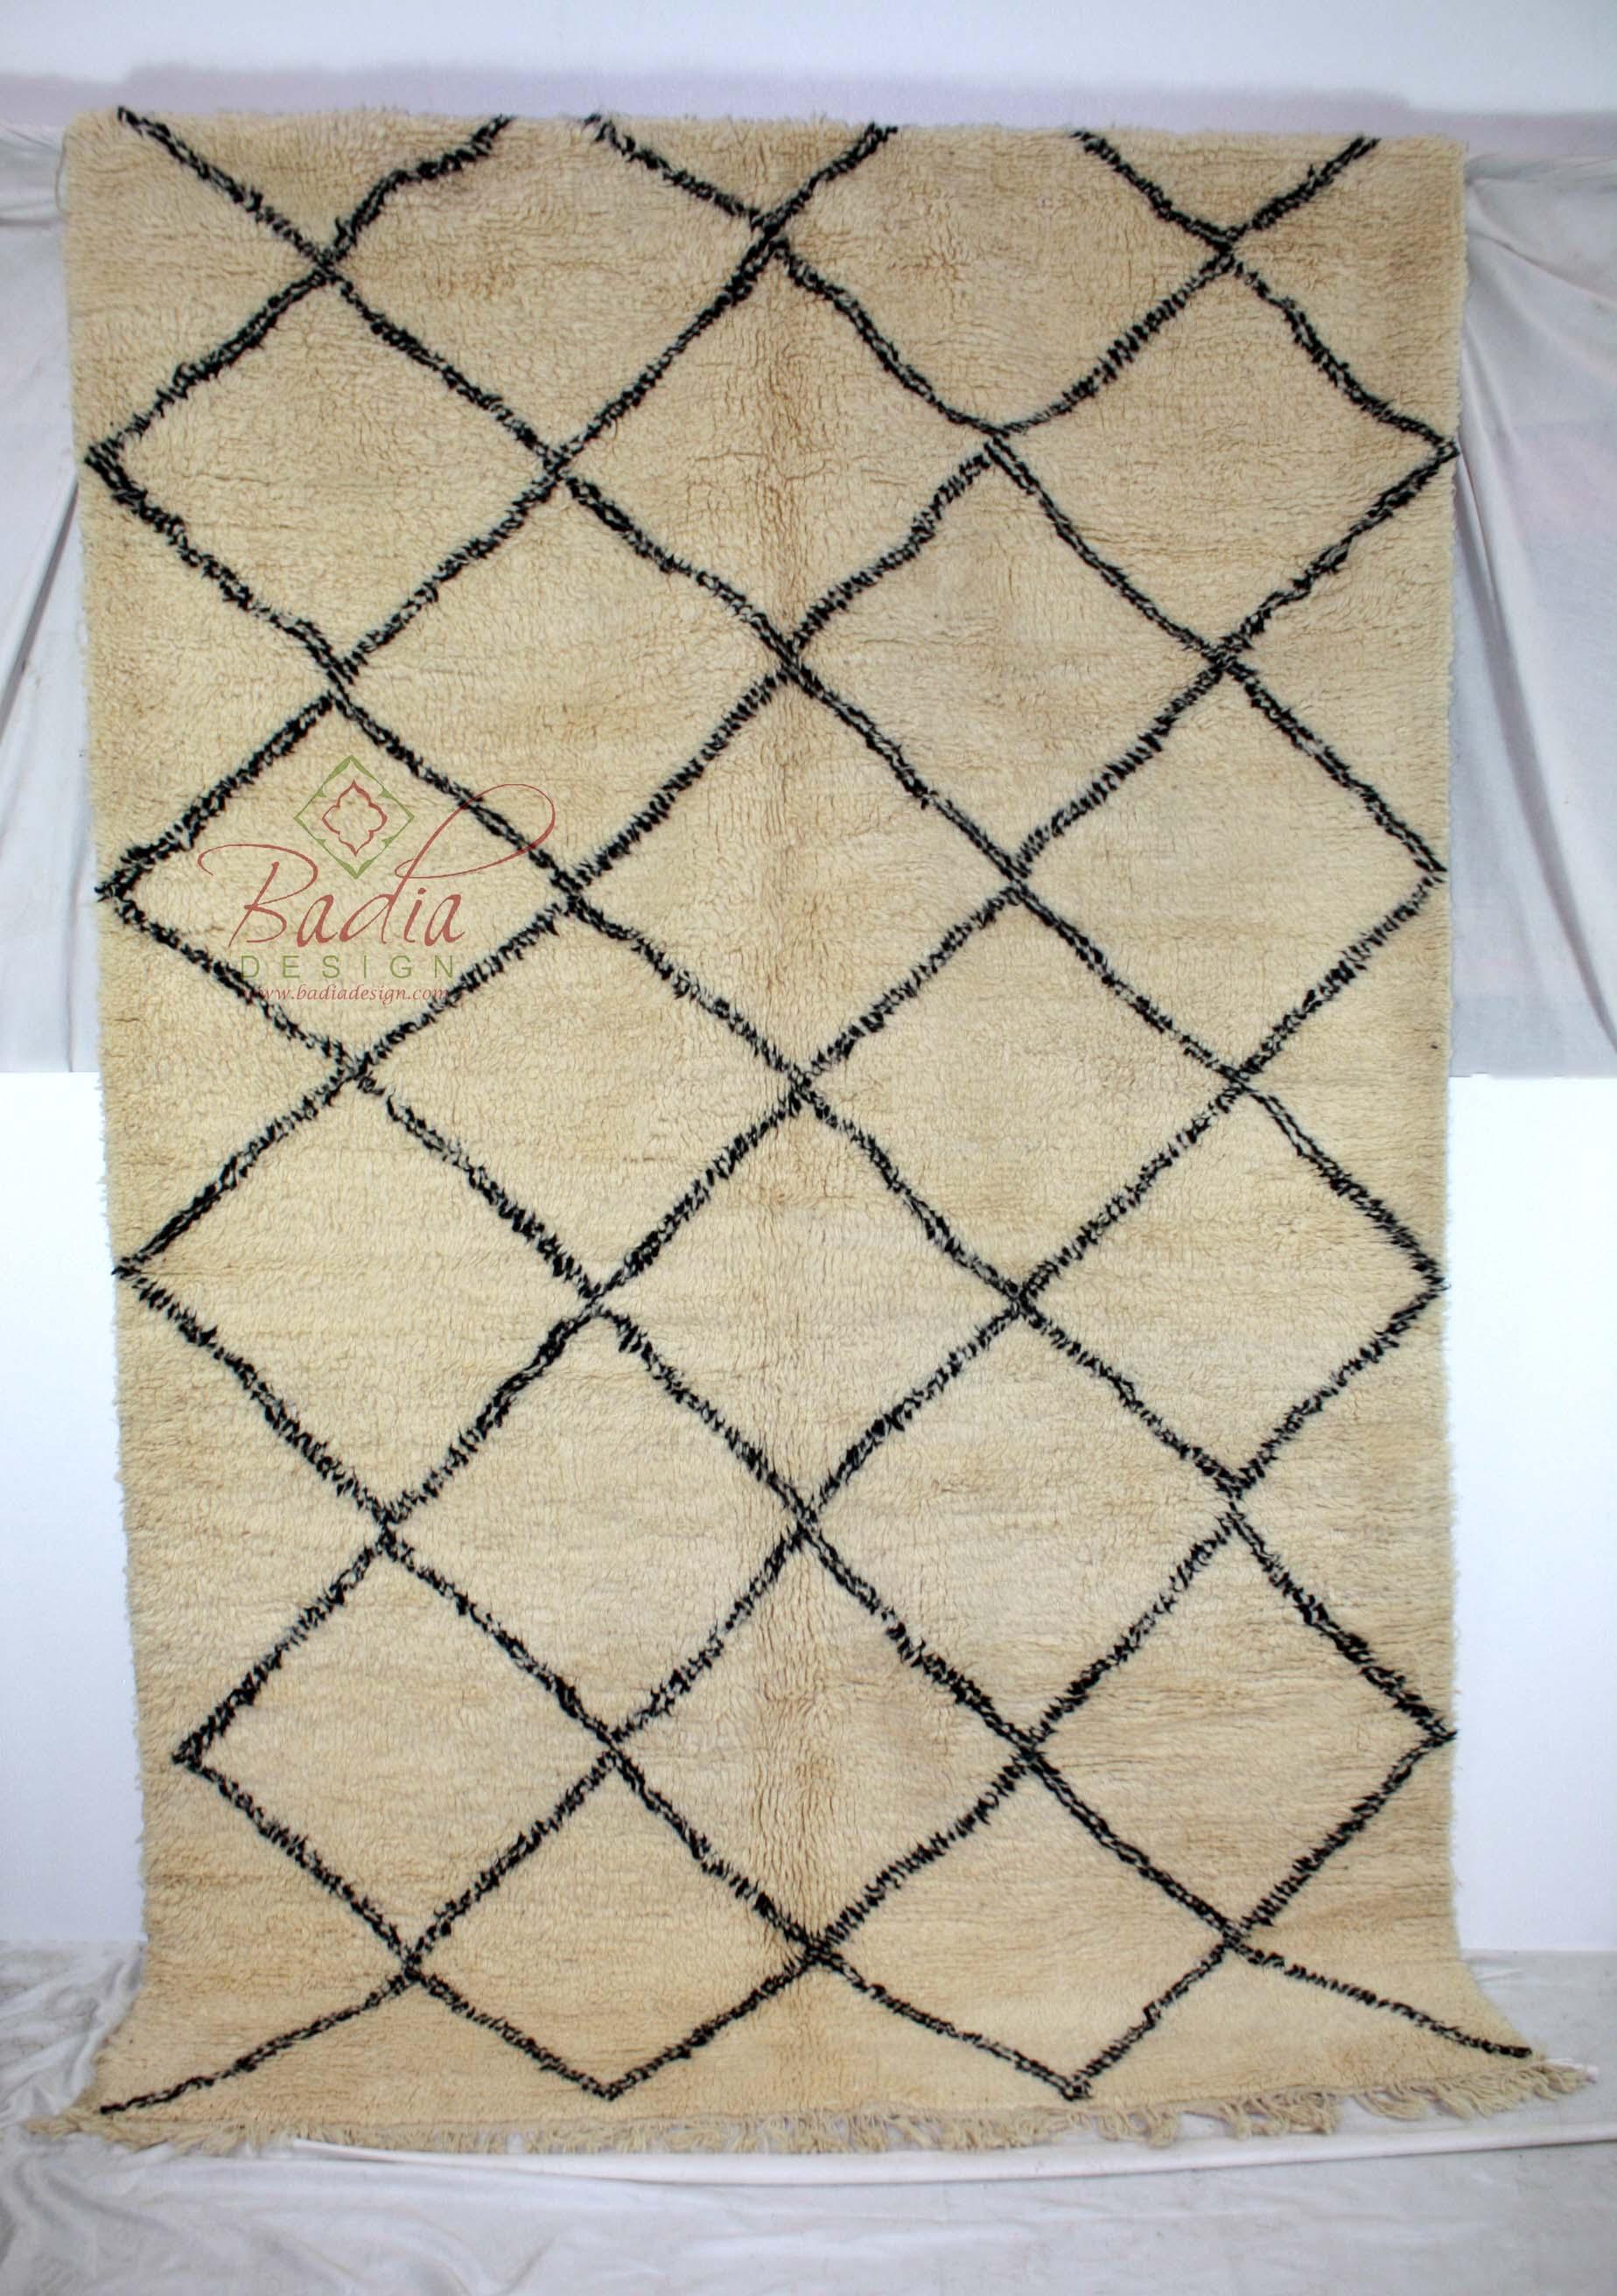 moroccan-beni-ourain-rugs-riverside-ca-cpt016.jpg